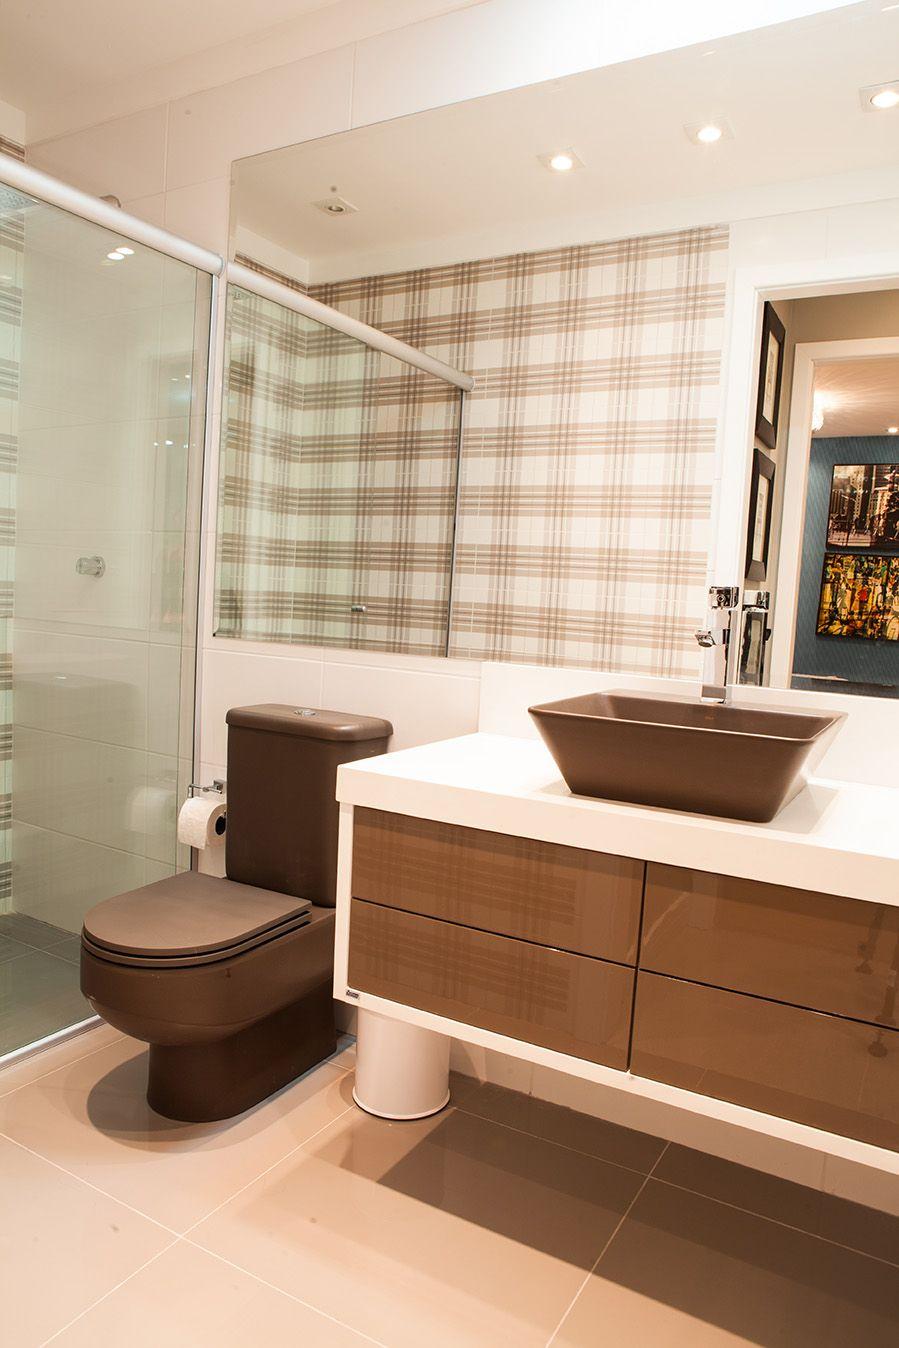 Estúdio - Atena Mixed Use - Banheiro